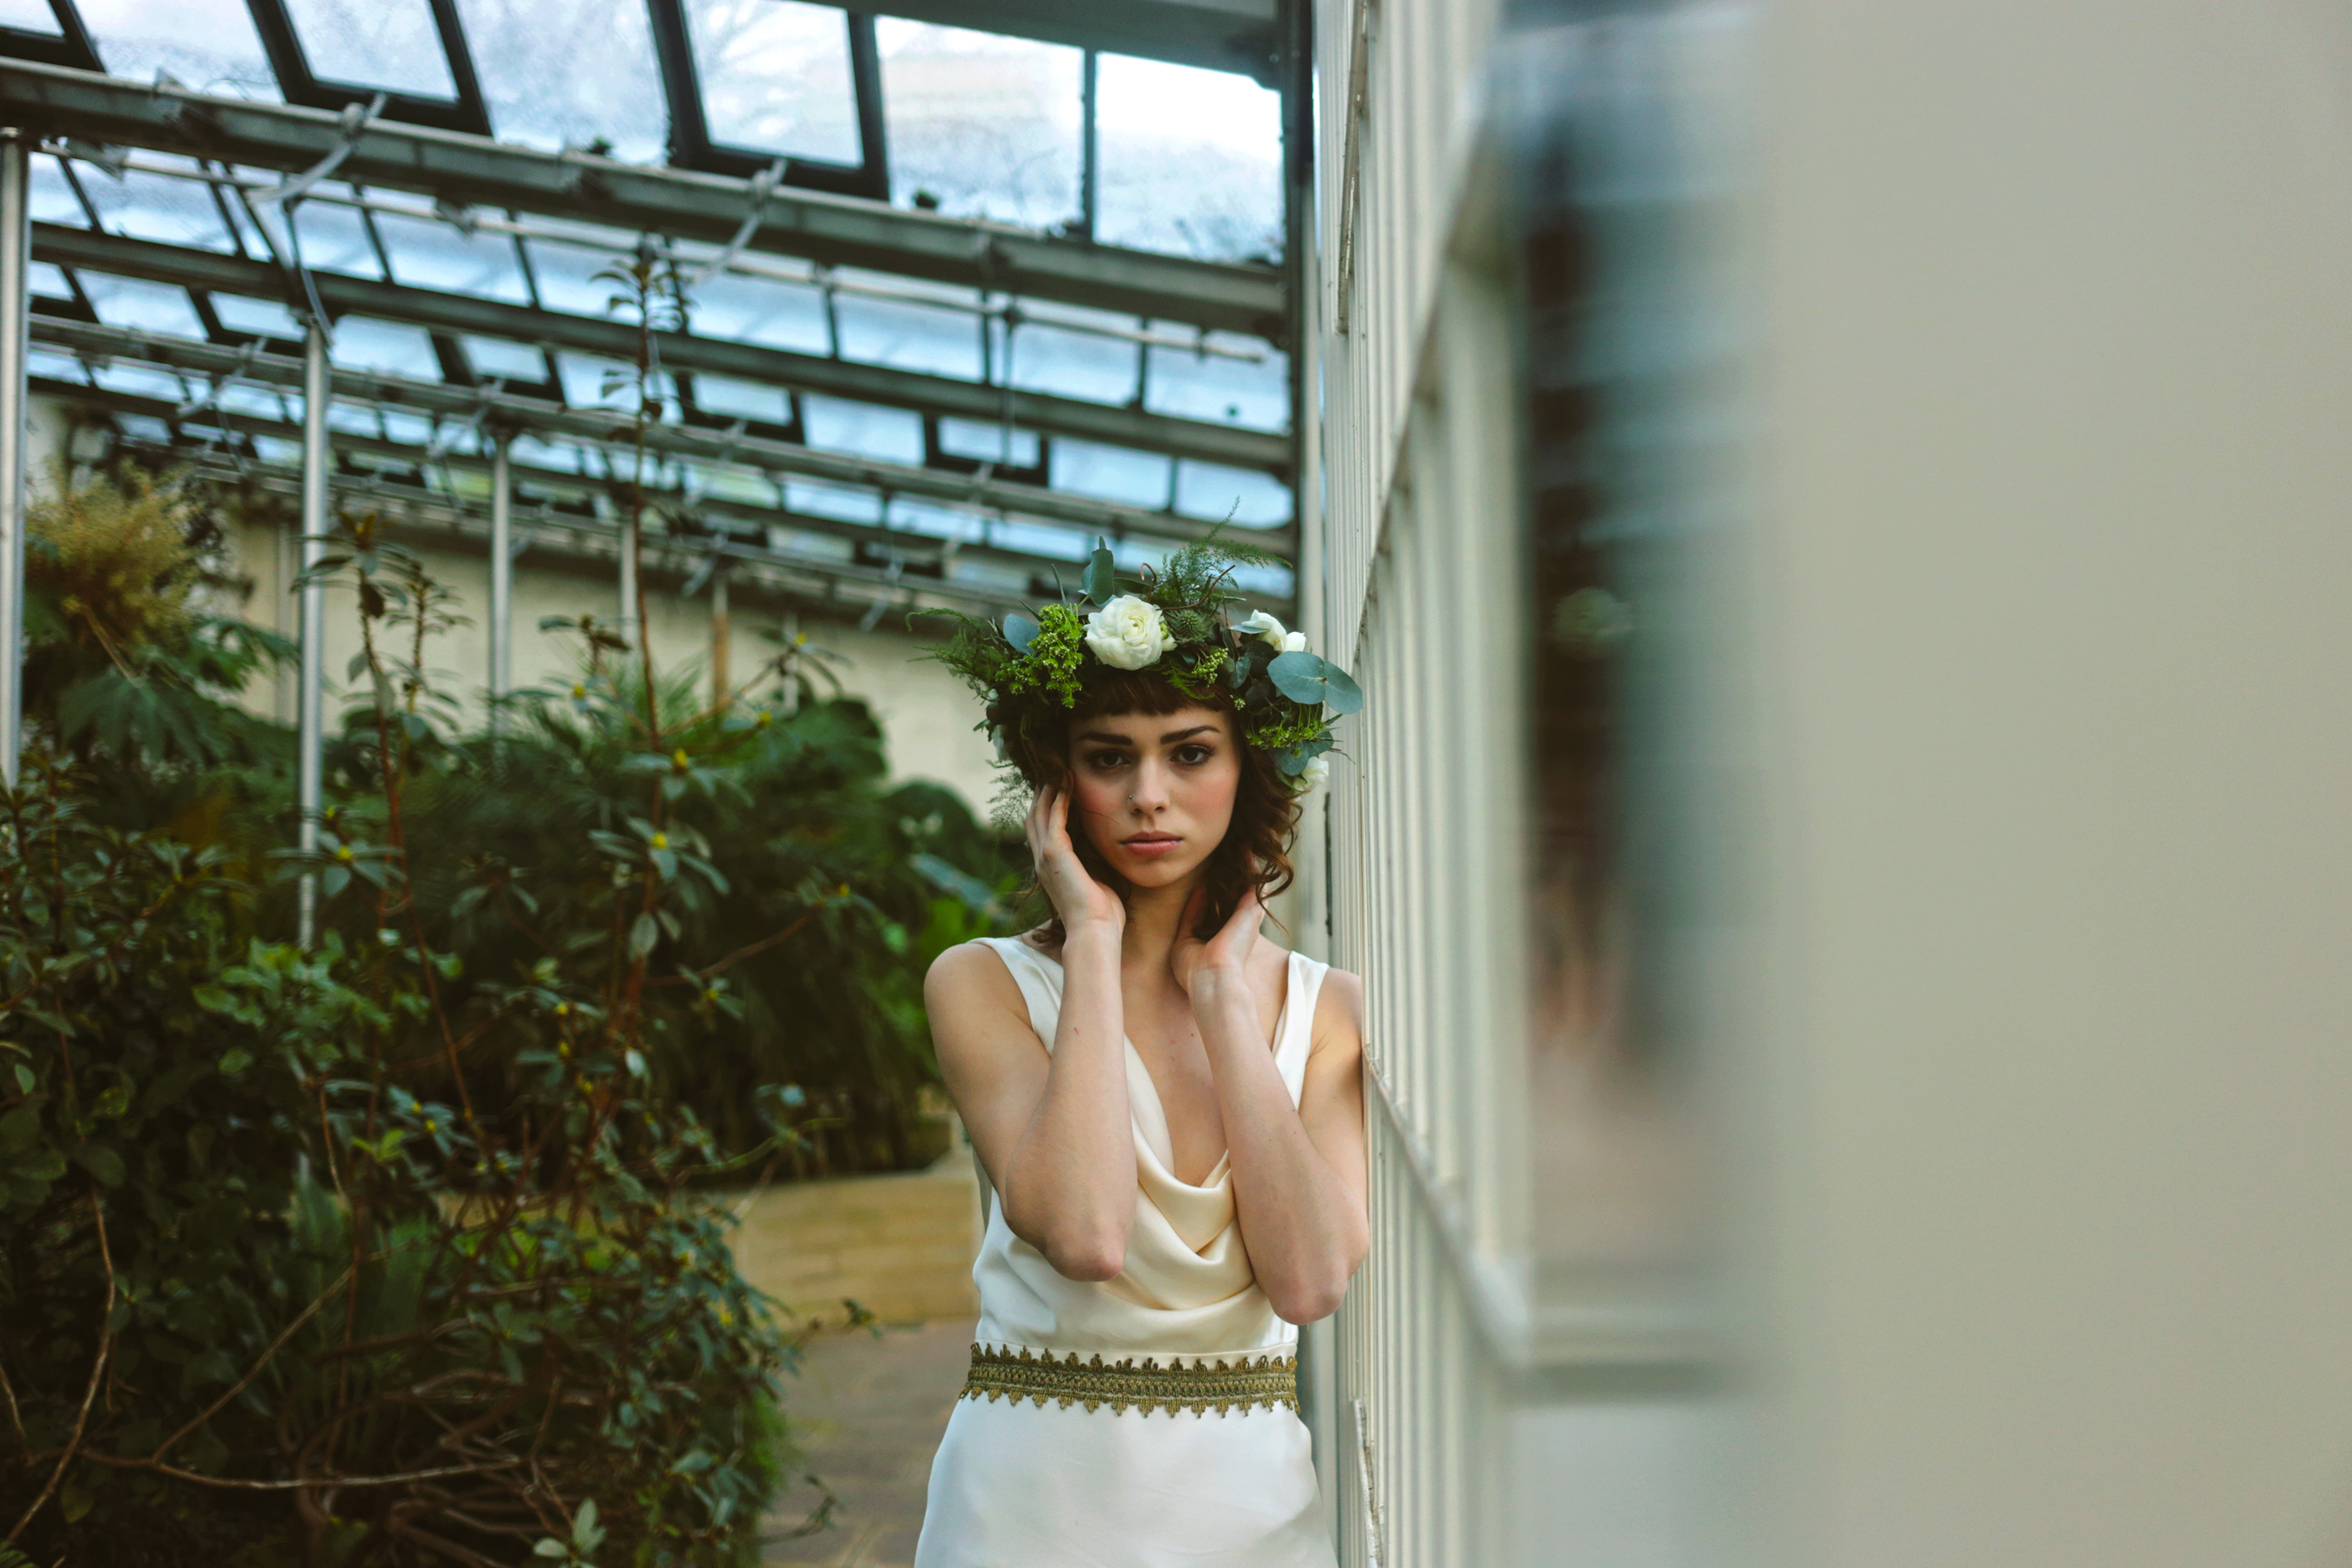 Winter-Bridal-Kate-Beaumont-Shelley-Richmond-Vintage-Wedding-Dress-1.jpg